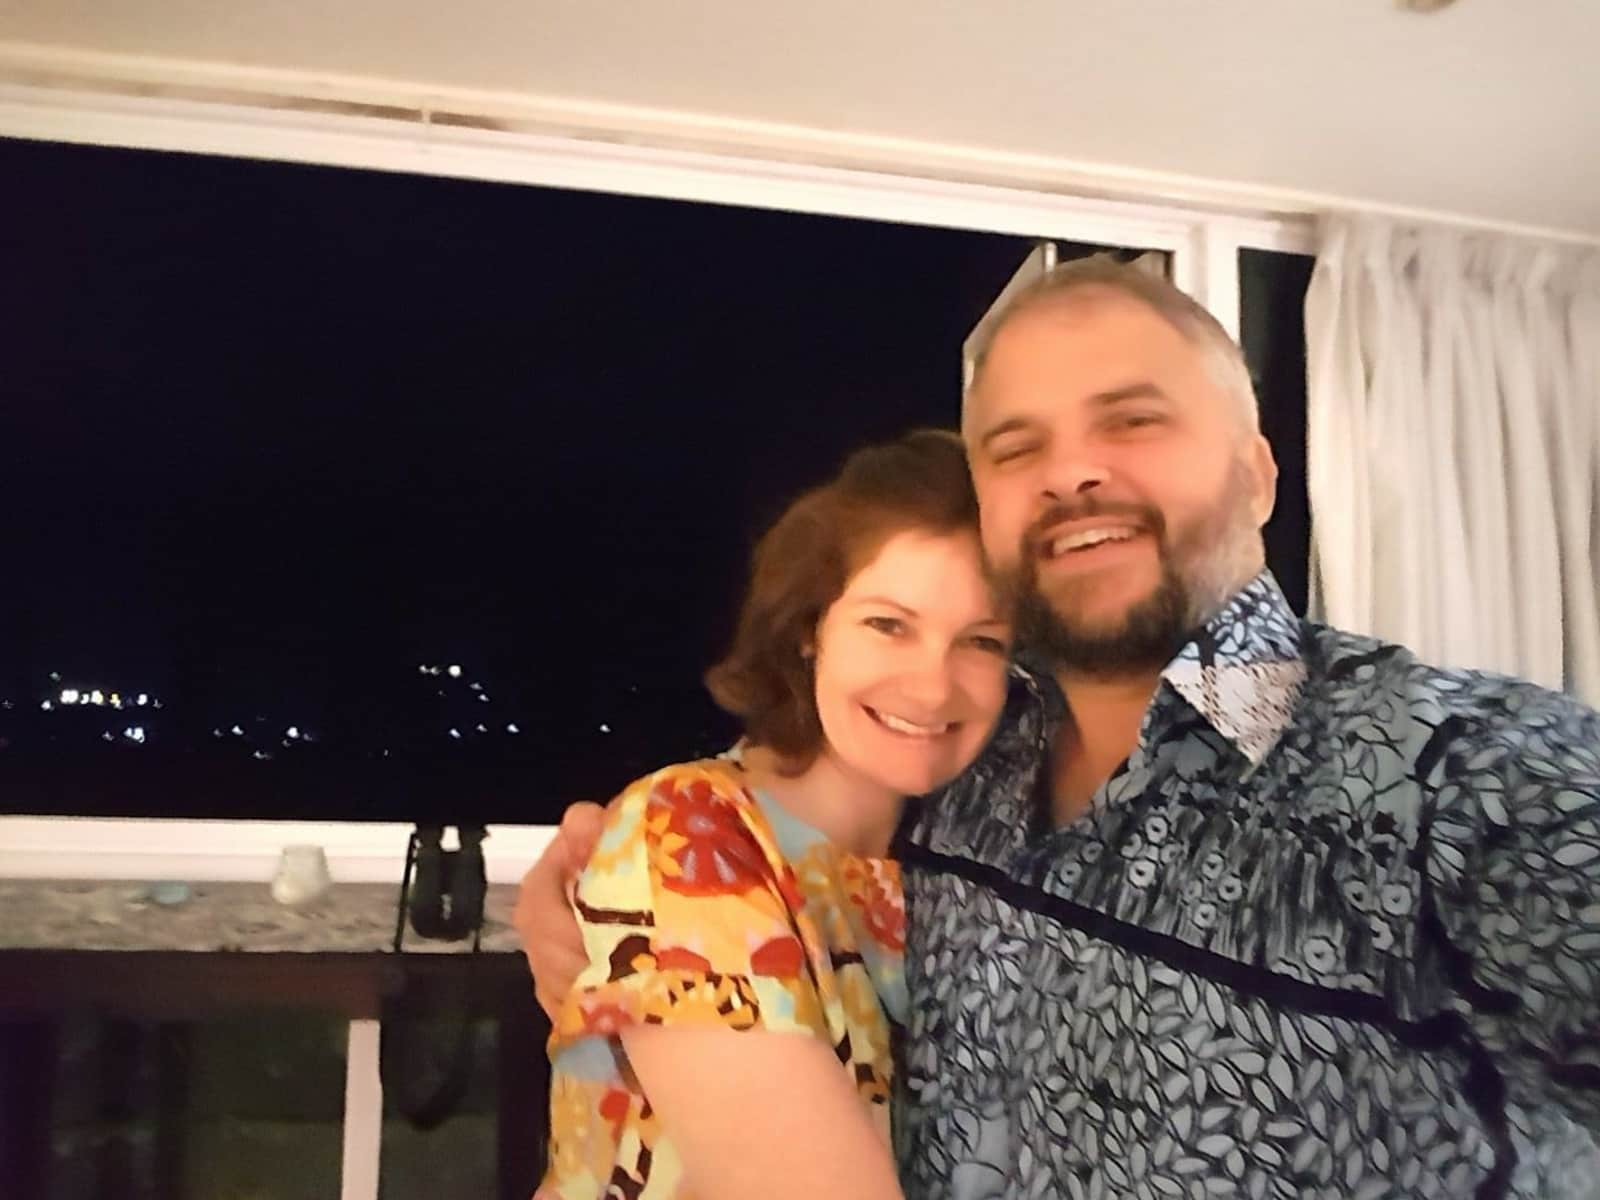 Bradley & Crystal from Hội An, Vietnam